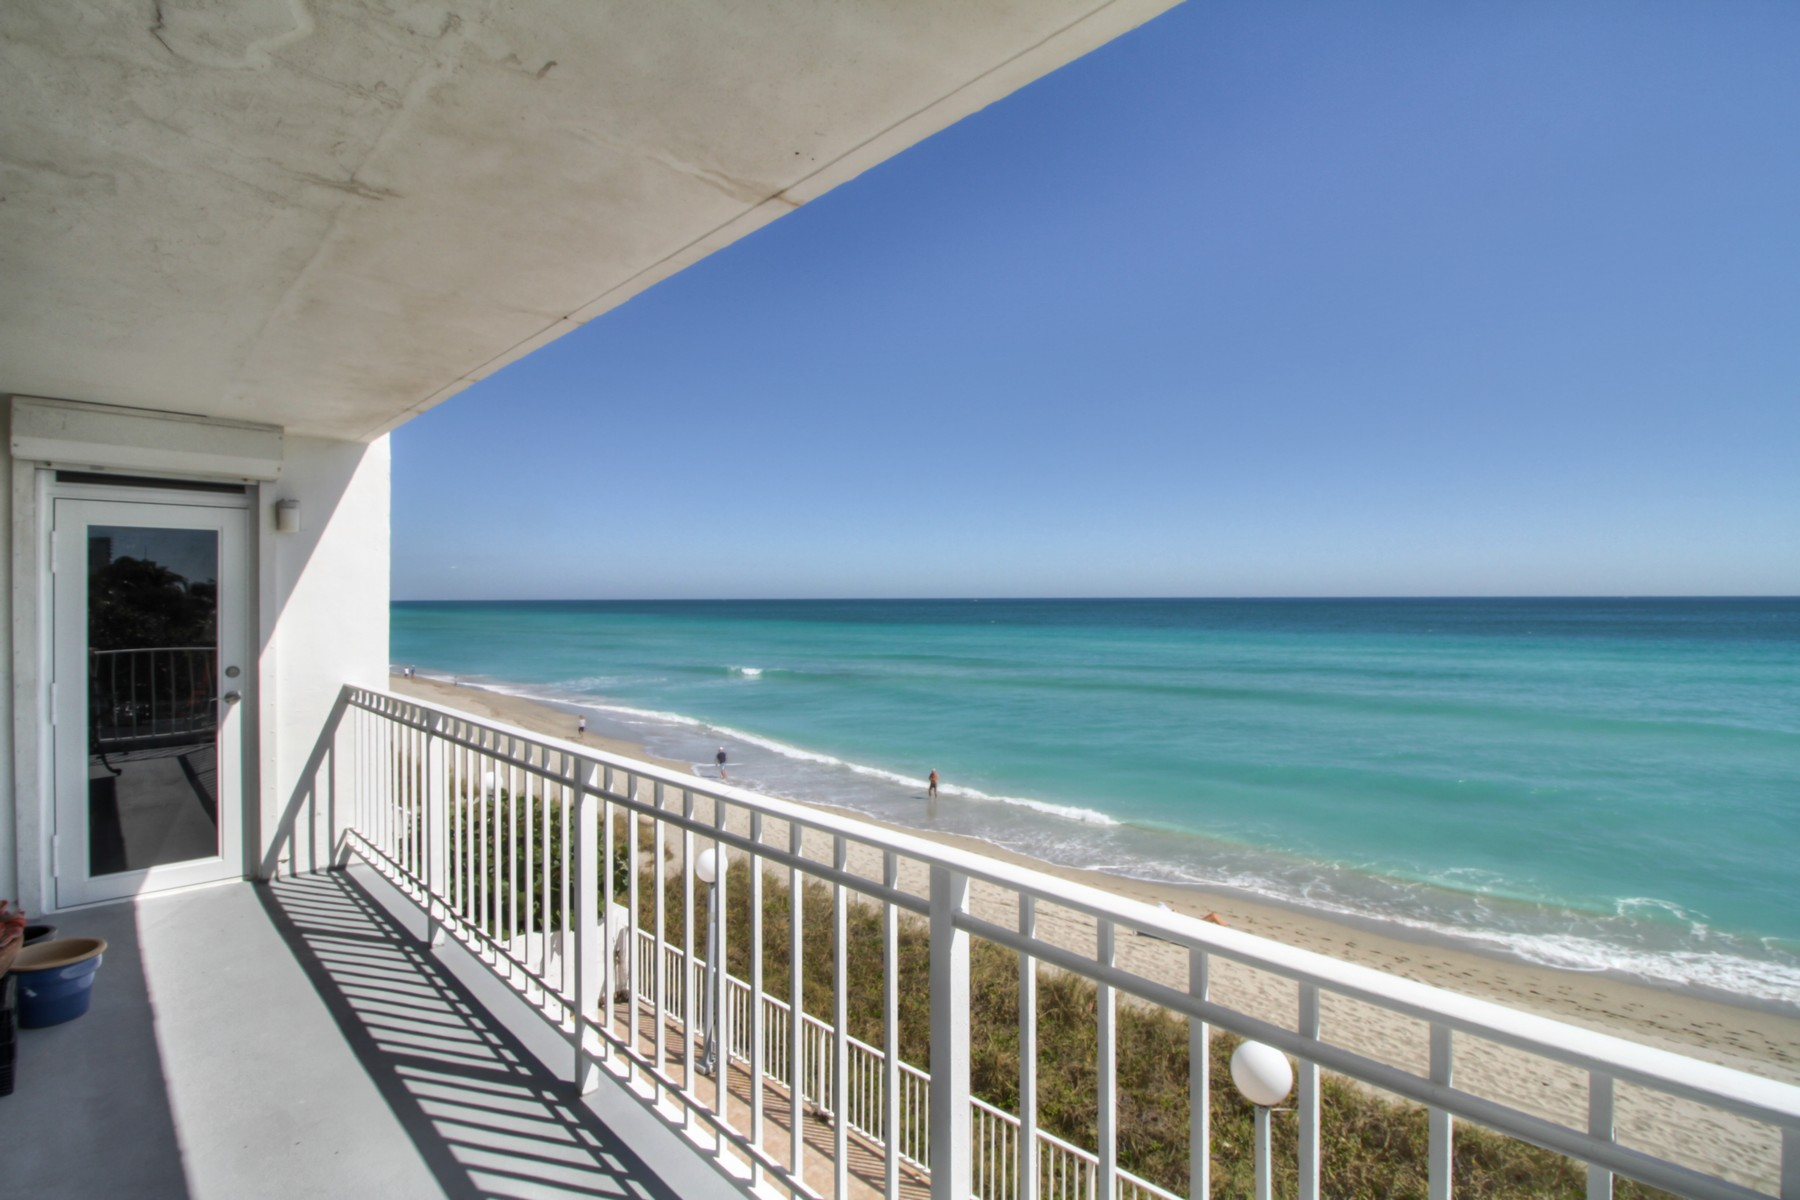 Condominio per Vendita alle ore 2751 S. Ocean Drive Unit# 305S 2751 S Ocean Dr 305S Hollywood, Florida, 33019 Stati Uniti